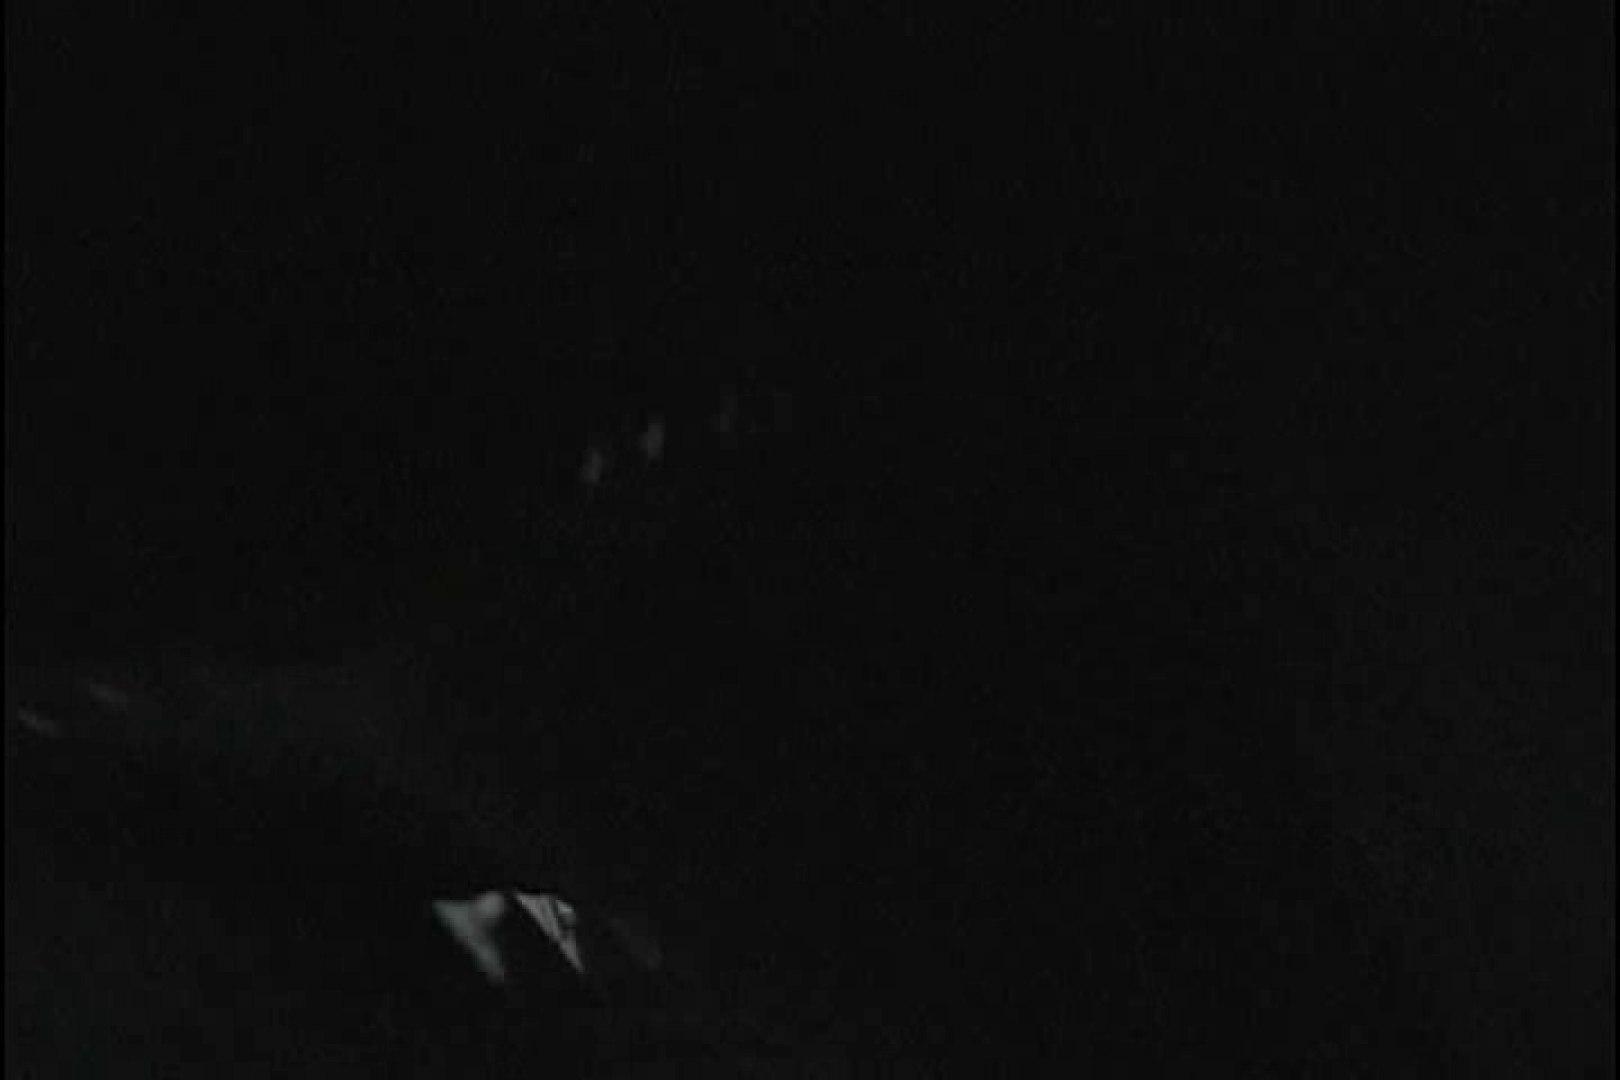 RQカメラ地獄Vol.11 レースクイーン編 セックス無修正動画無料 86画像 8